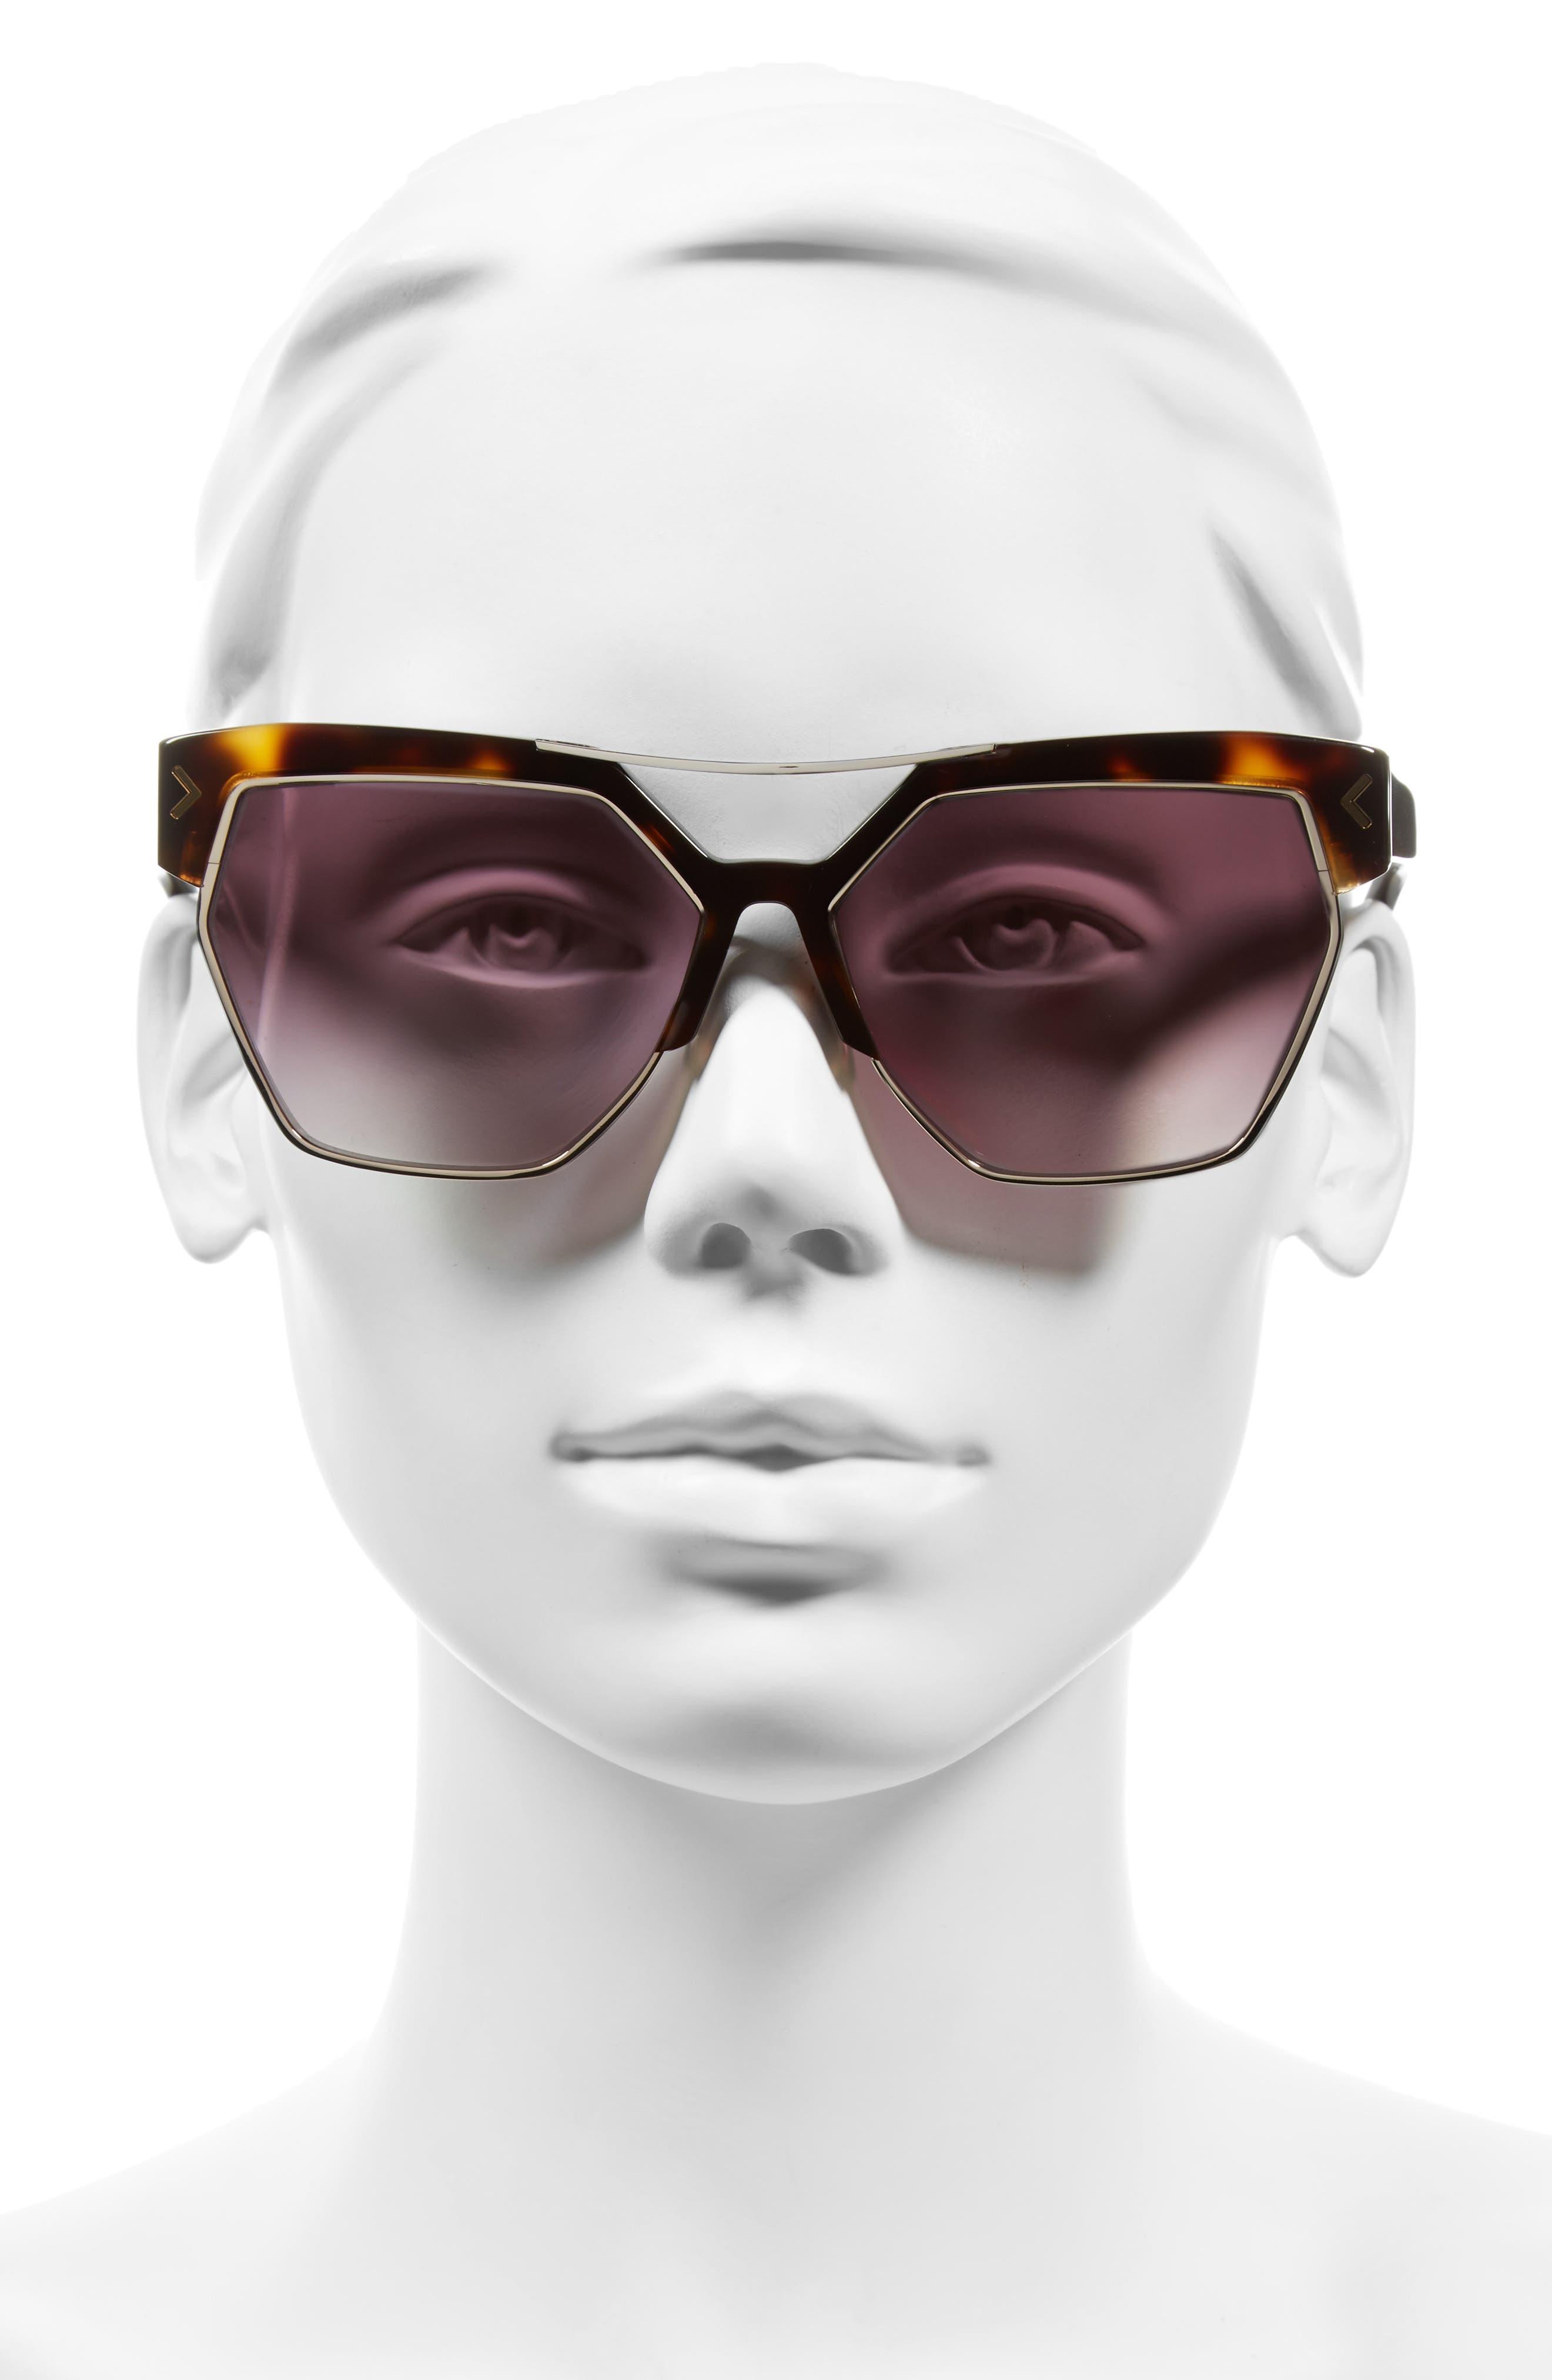 55mm Retro Sunglasses,                             Alternate thumbnail 9, color,